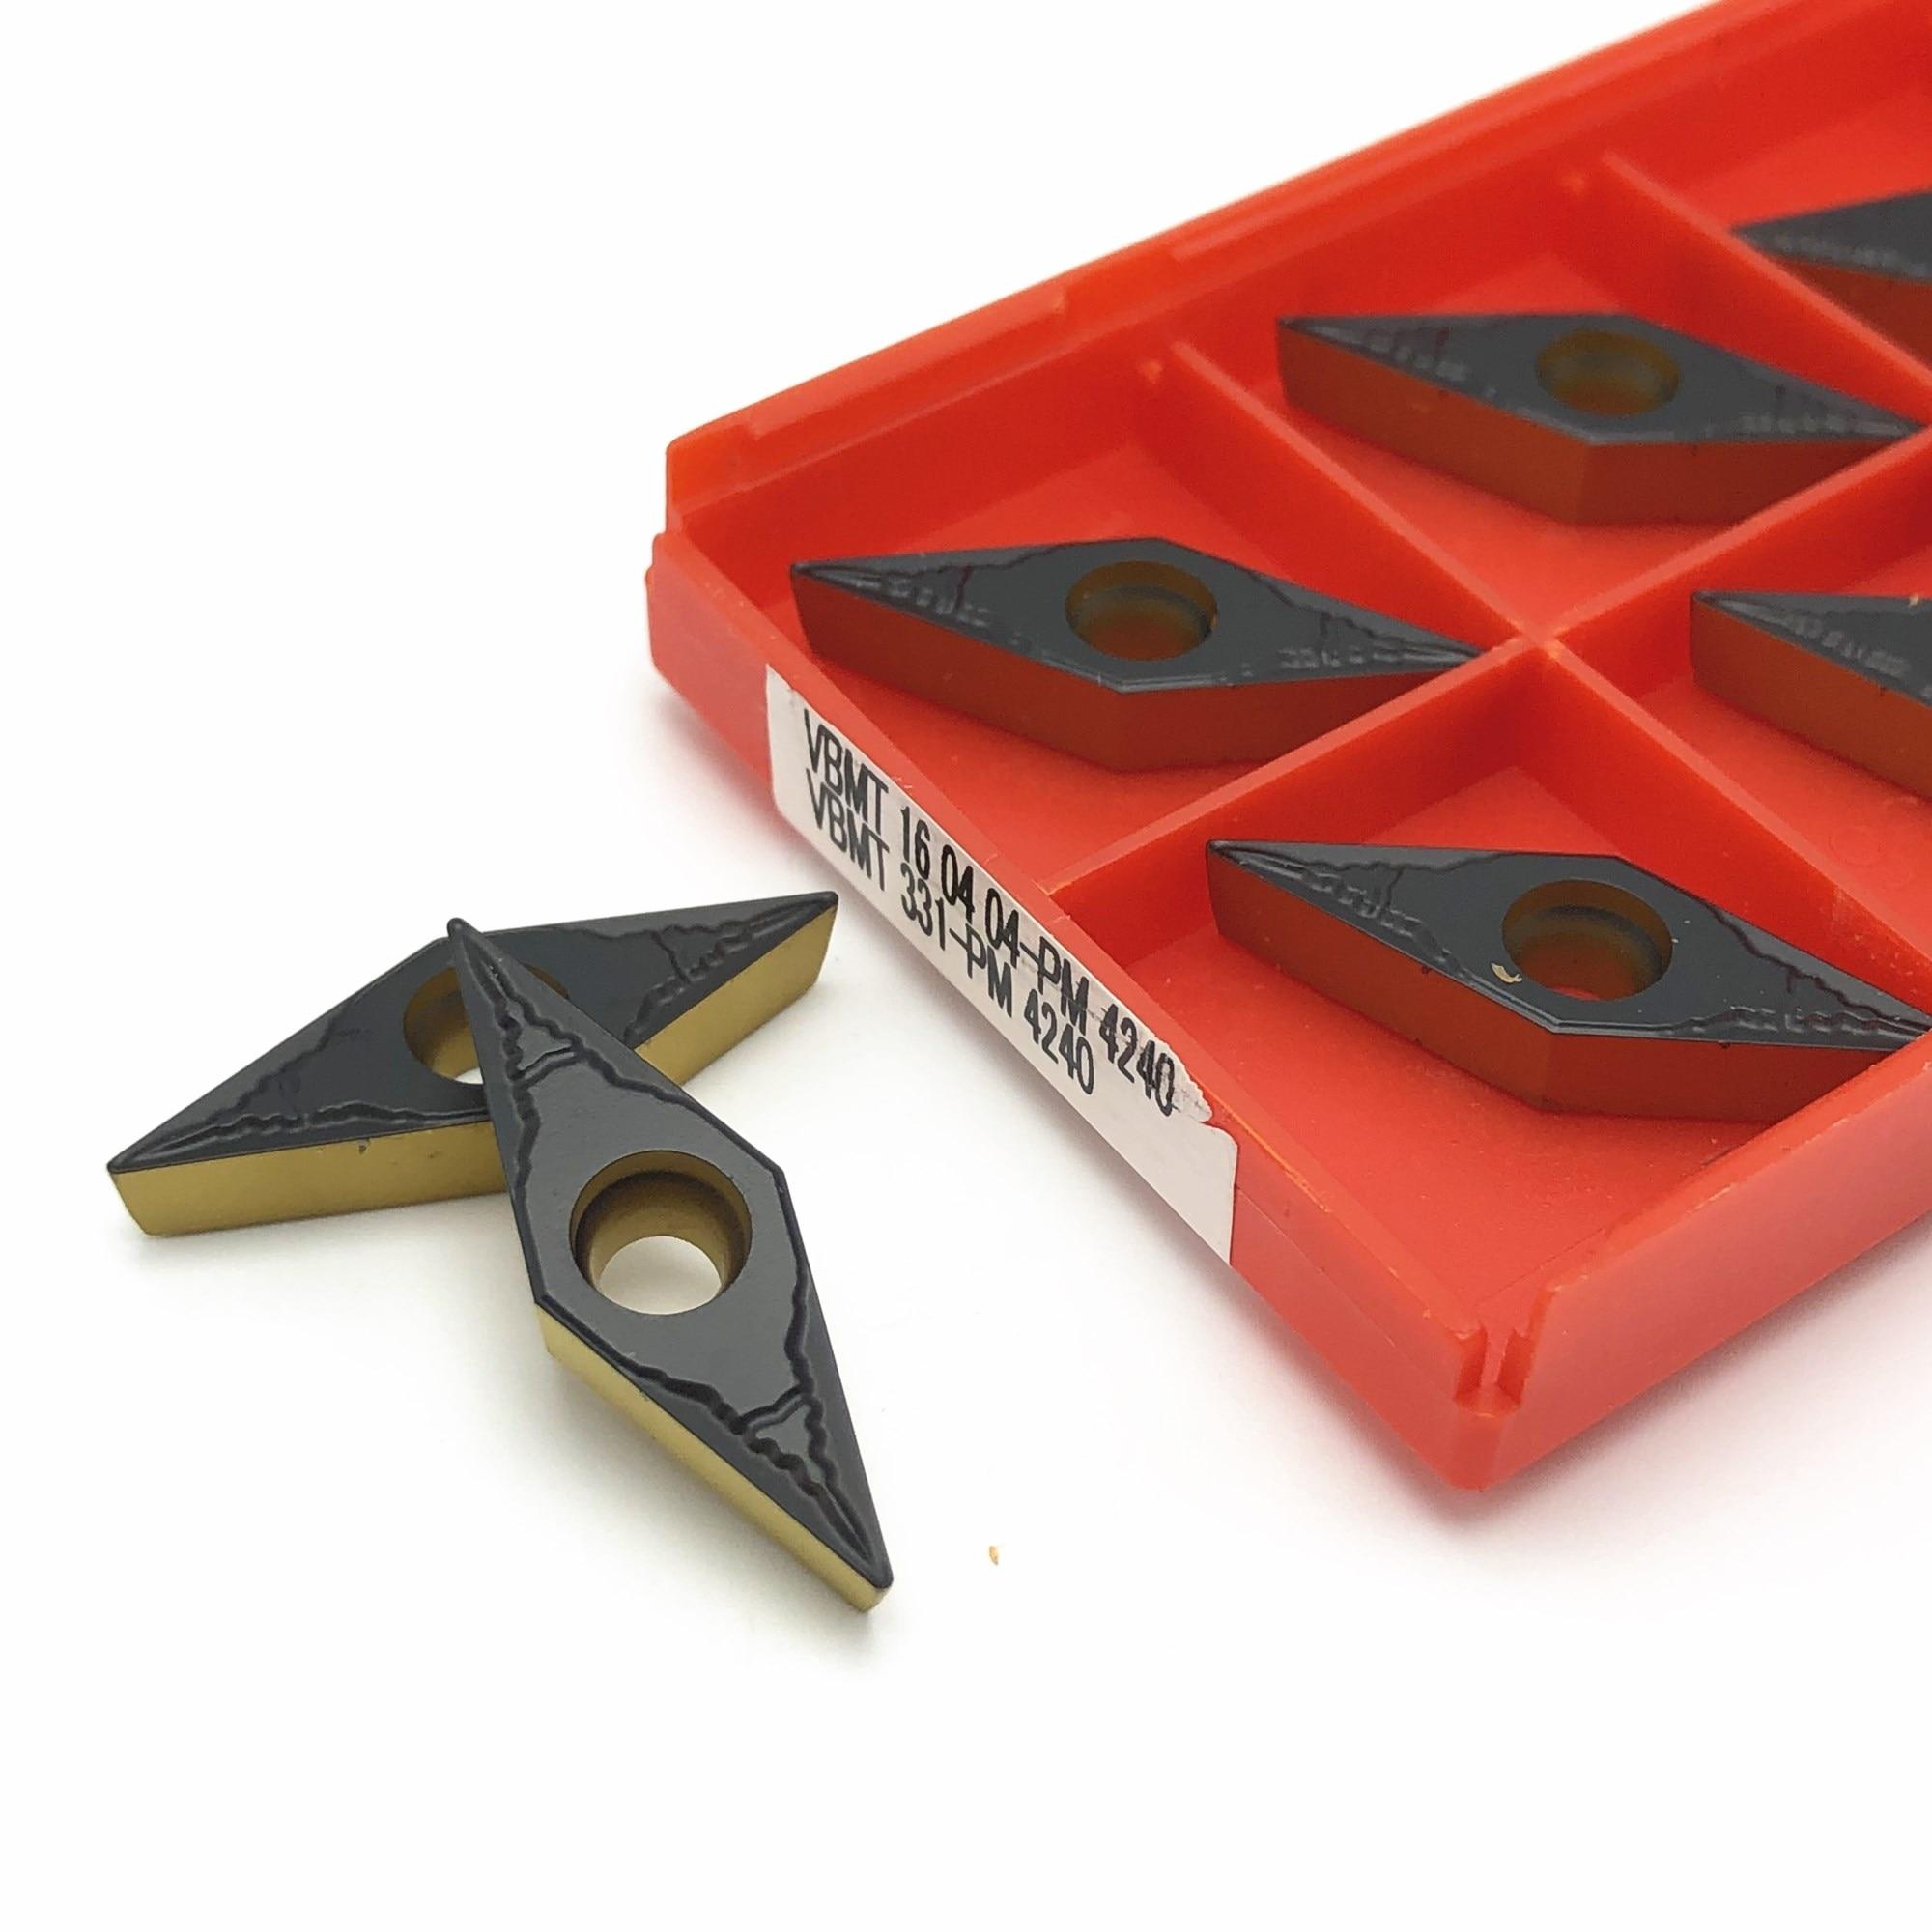 Turning tool VBMT160404 PM 4240 high quality carbide insert CNC machine tool milling cutter VBMT160408 lathe bladeTurning tool VBMT160404 PM 4240 high quality carbide insert CNC machine tool milling cutter VBMT160408 lathe blade